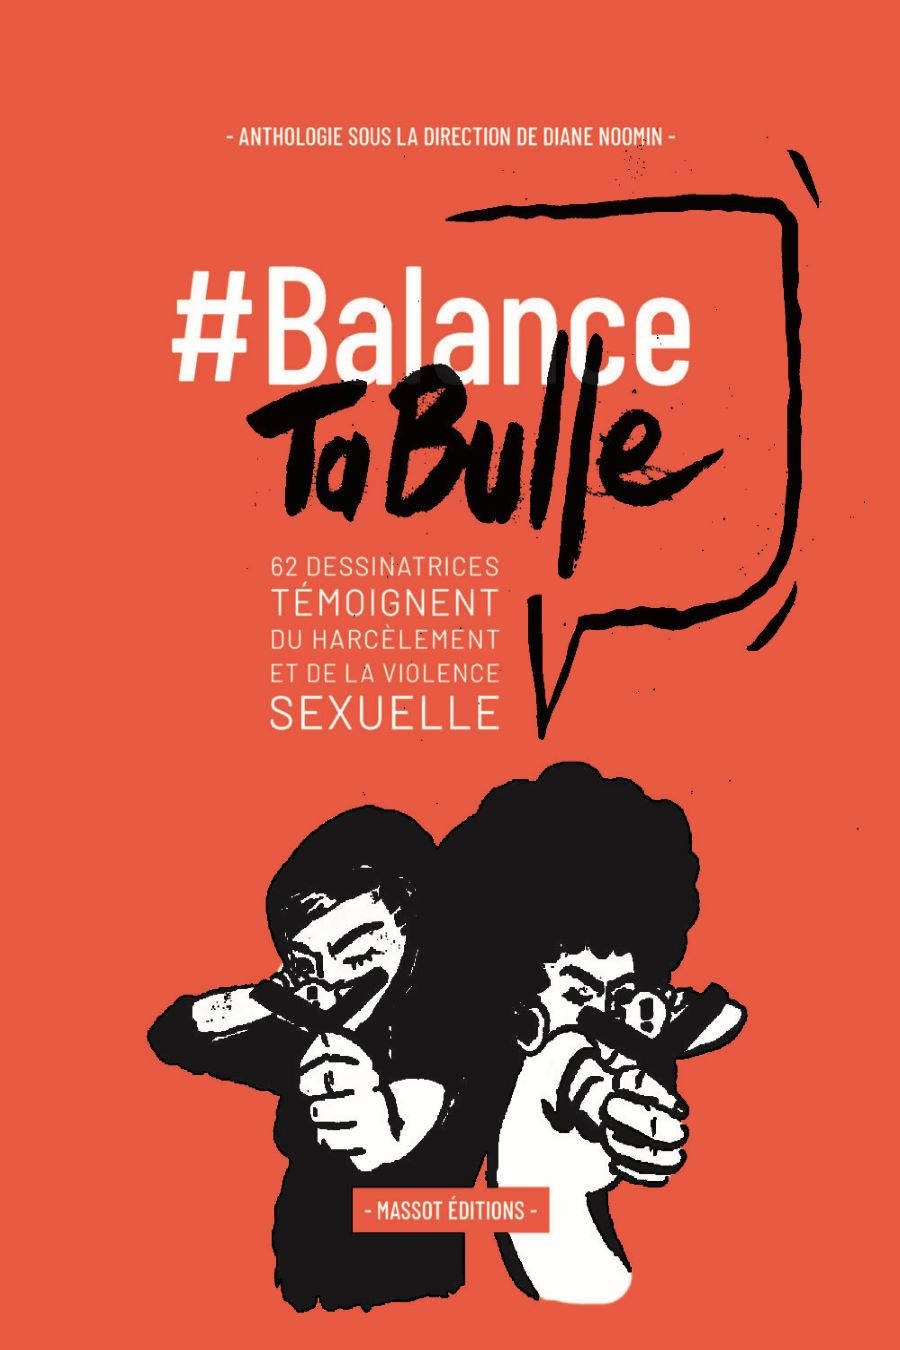 #Balancetabulle